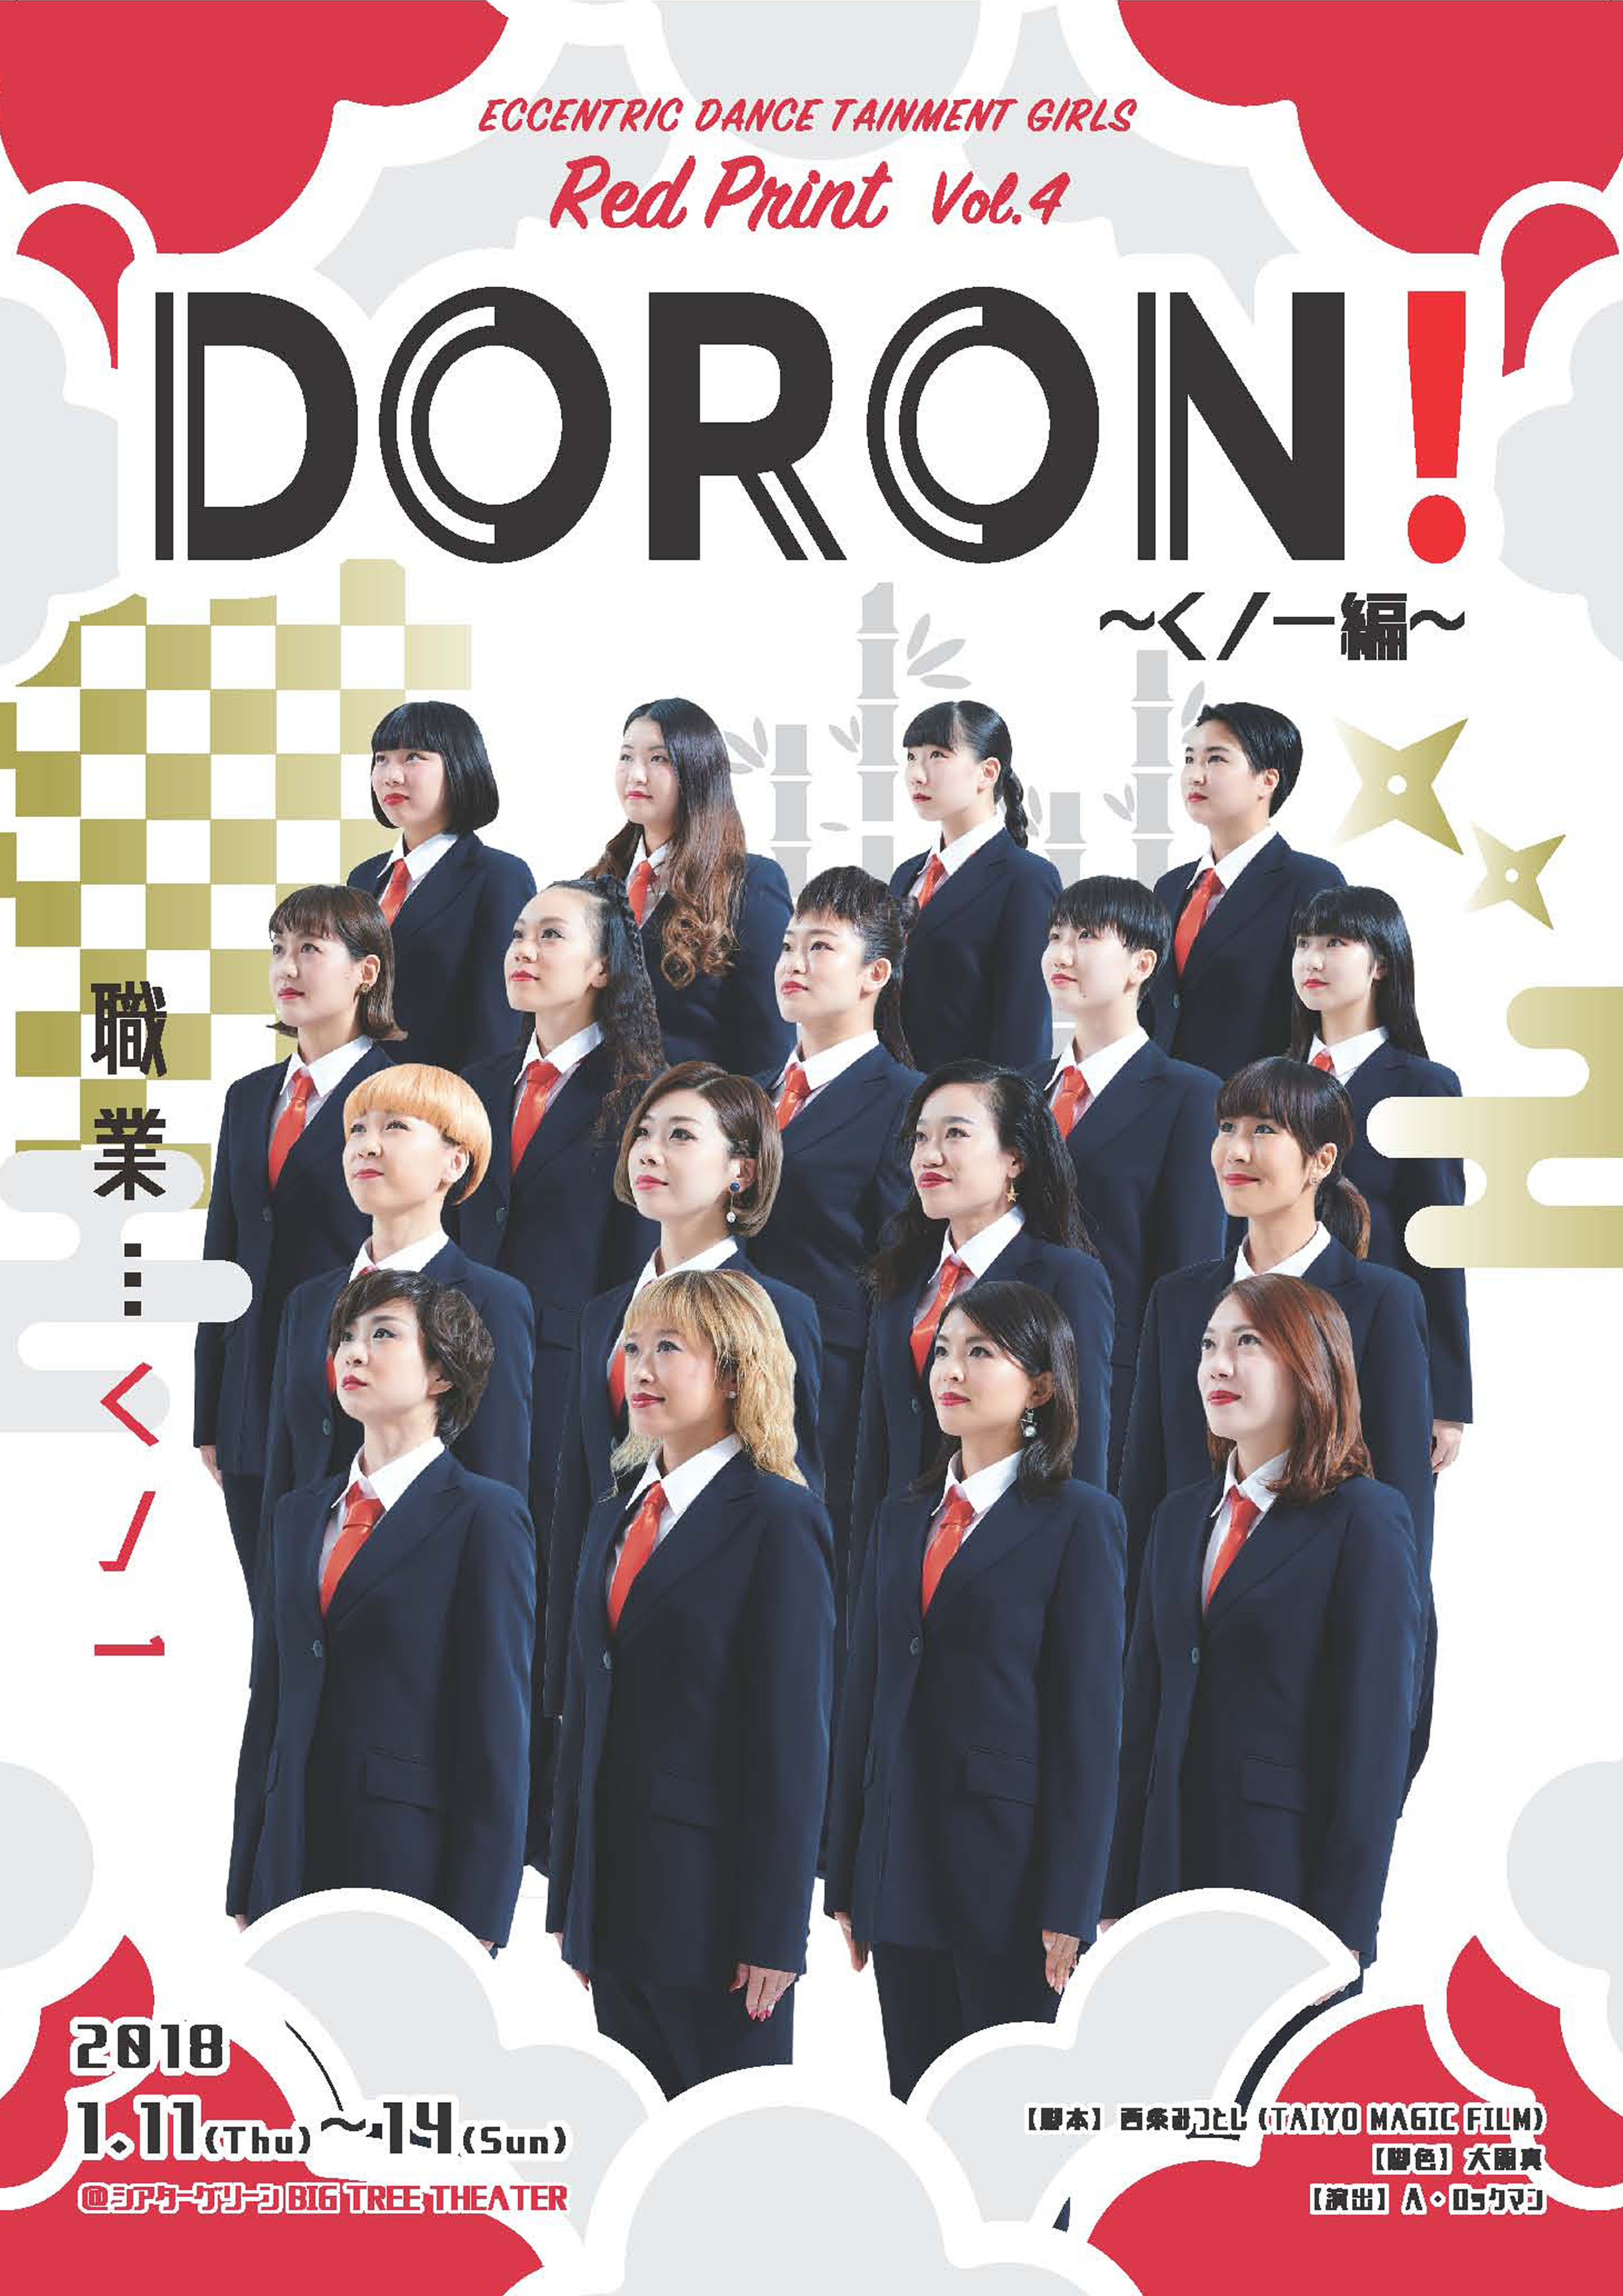 DORON!表面